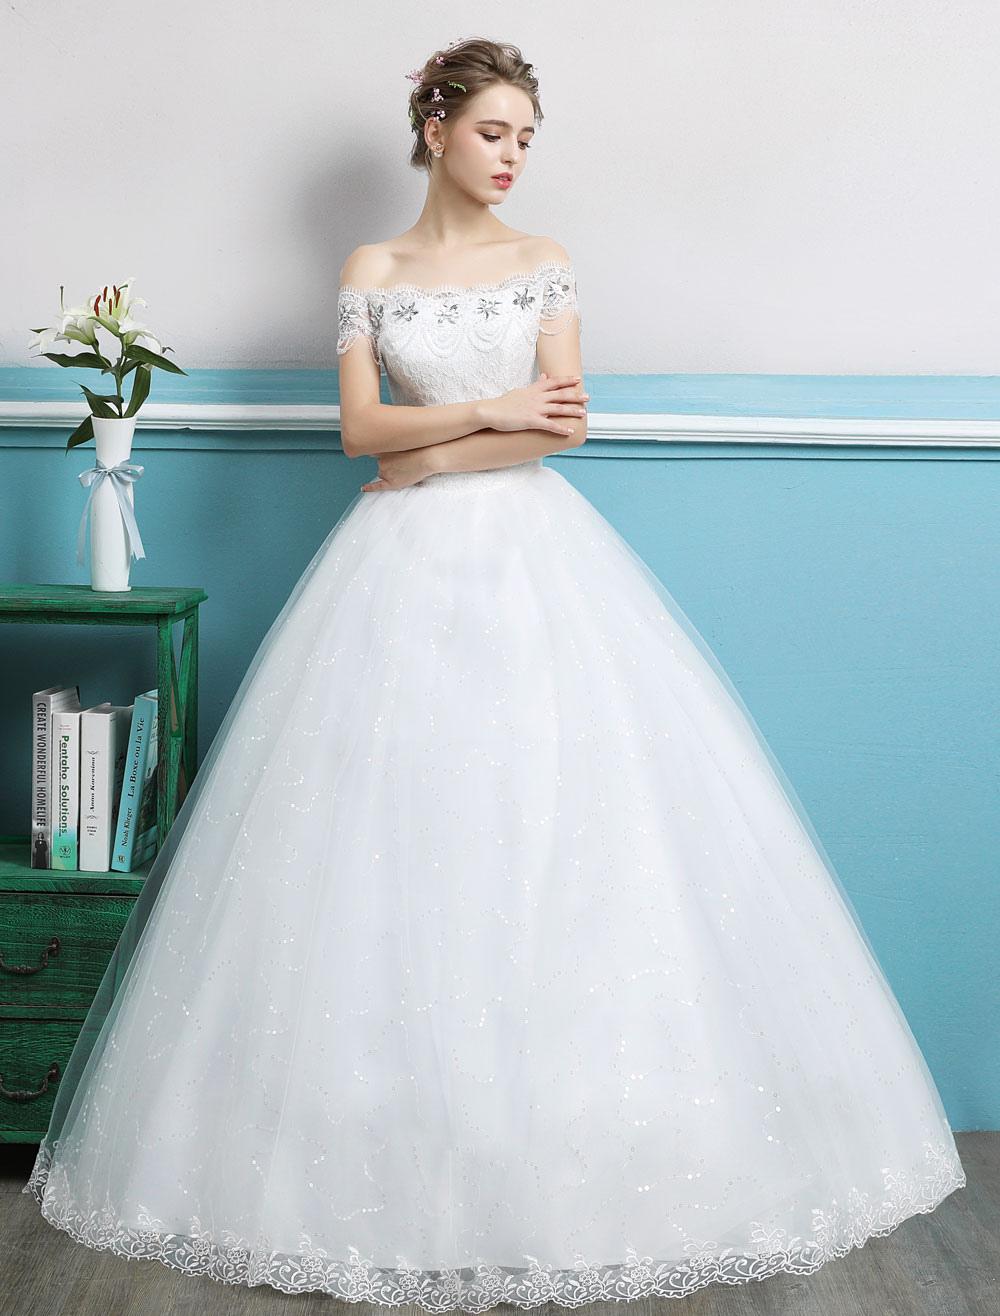 Princess Ball Gown Wedding Dresses Off Shoulder Lace Rhinestones ...